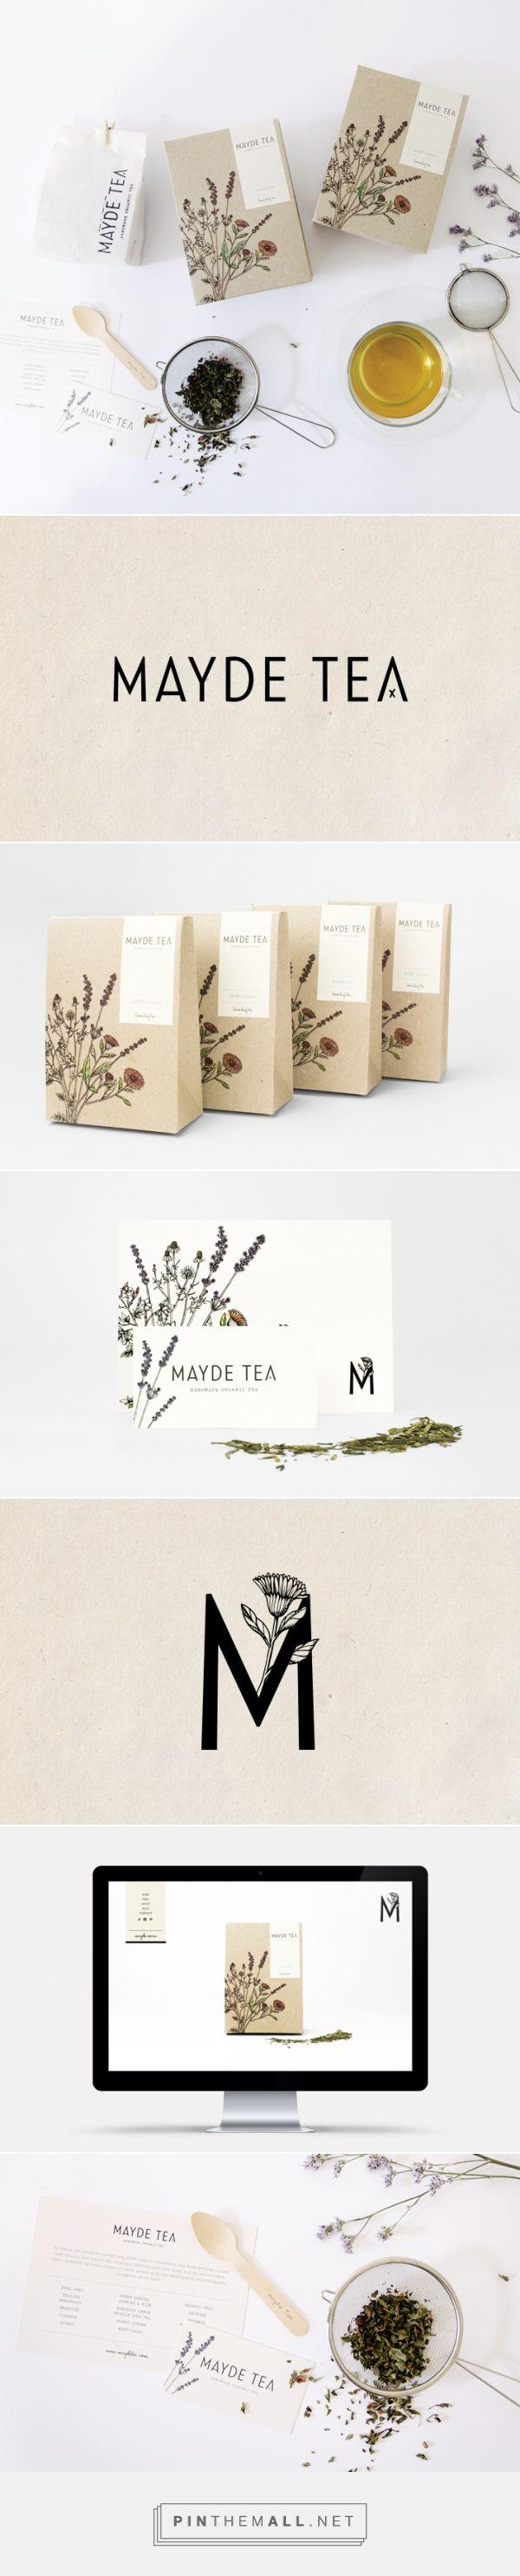 Mayde Tea - Smack Bang Designs - created via http://pinthemall.net